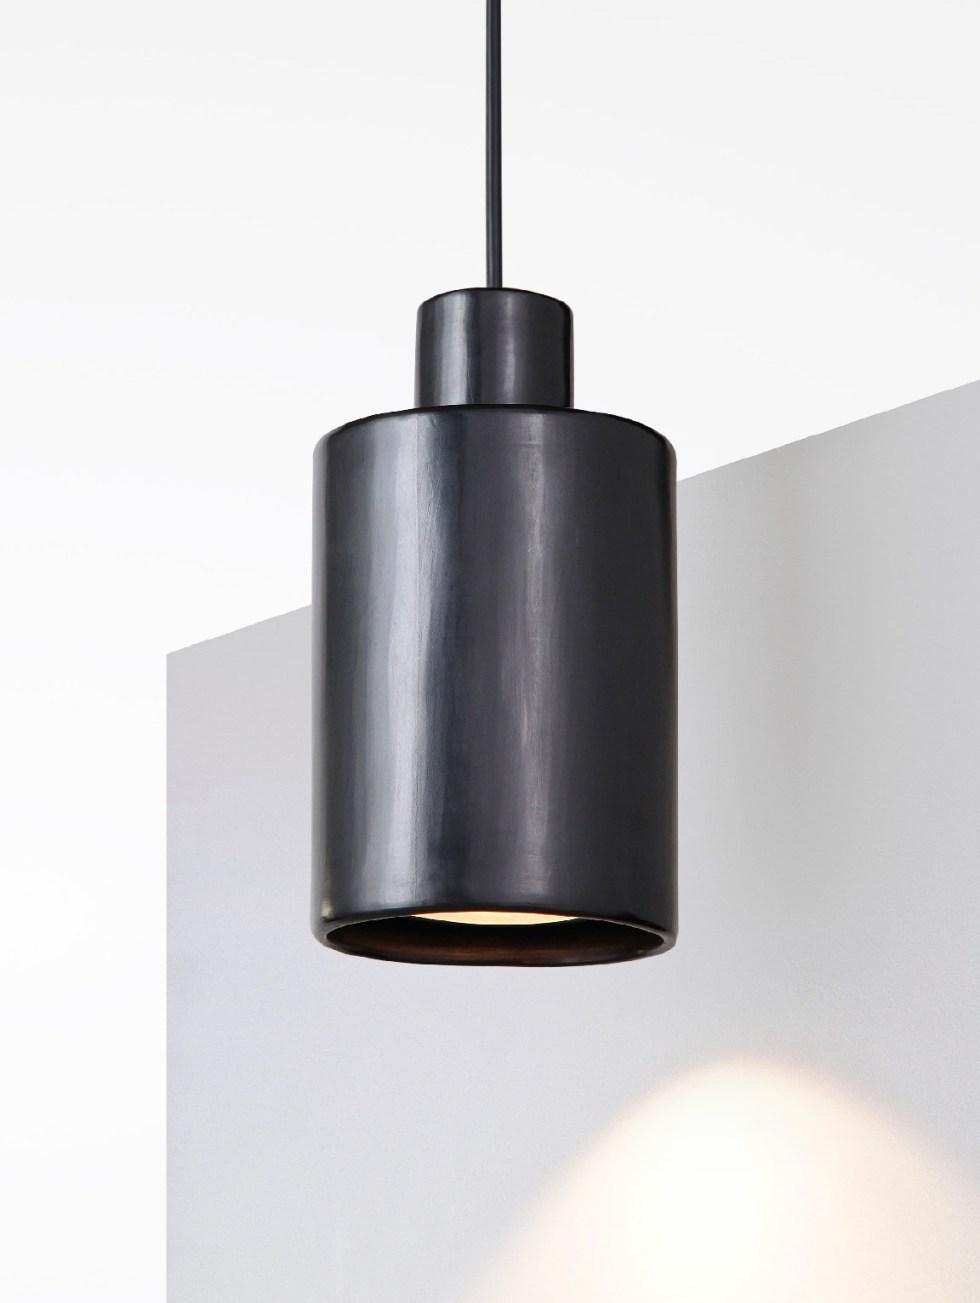 David Pompa Can Large pendant lamp